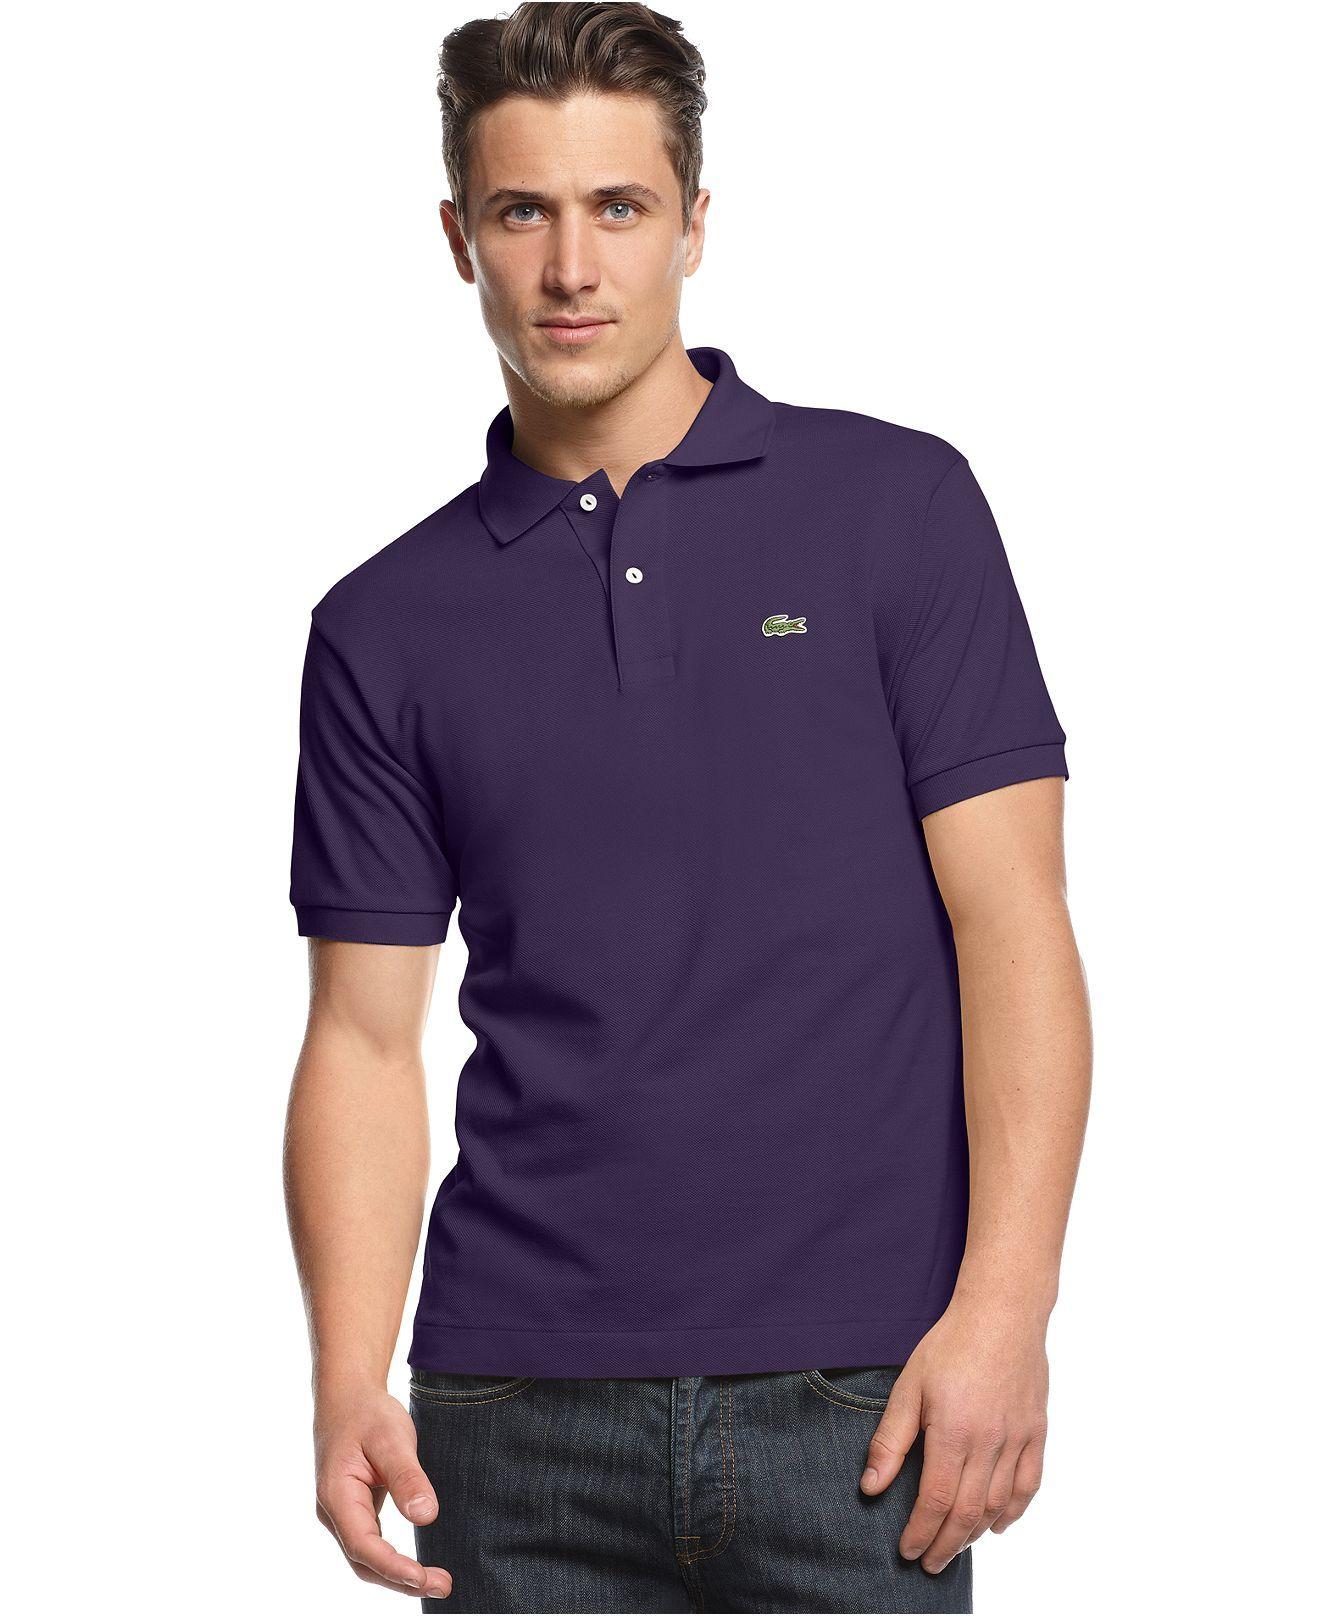 Lacoste Shirt Classic Pique Polo Shirt Mens Polos Macy S